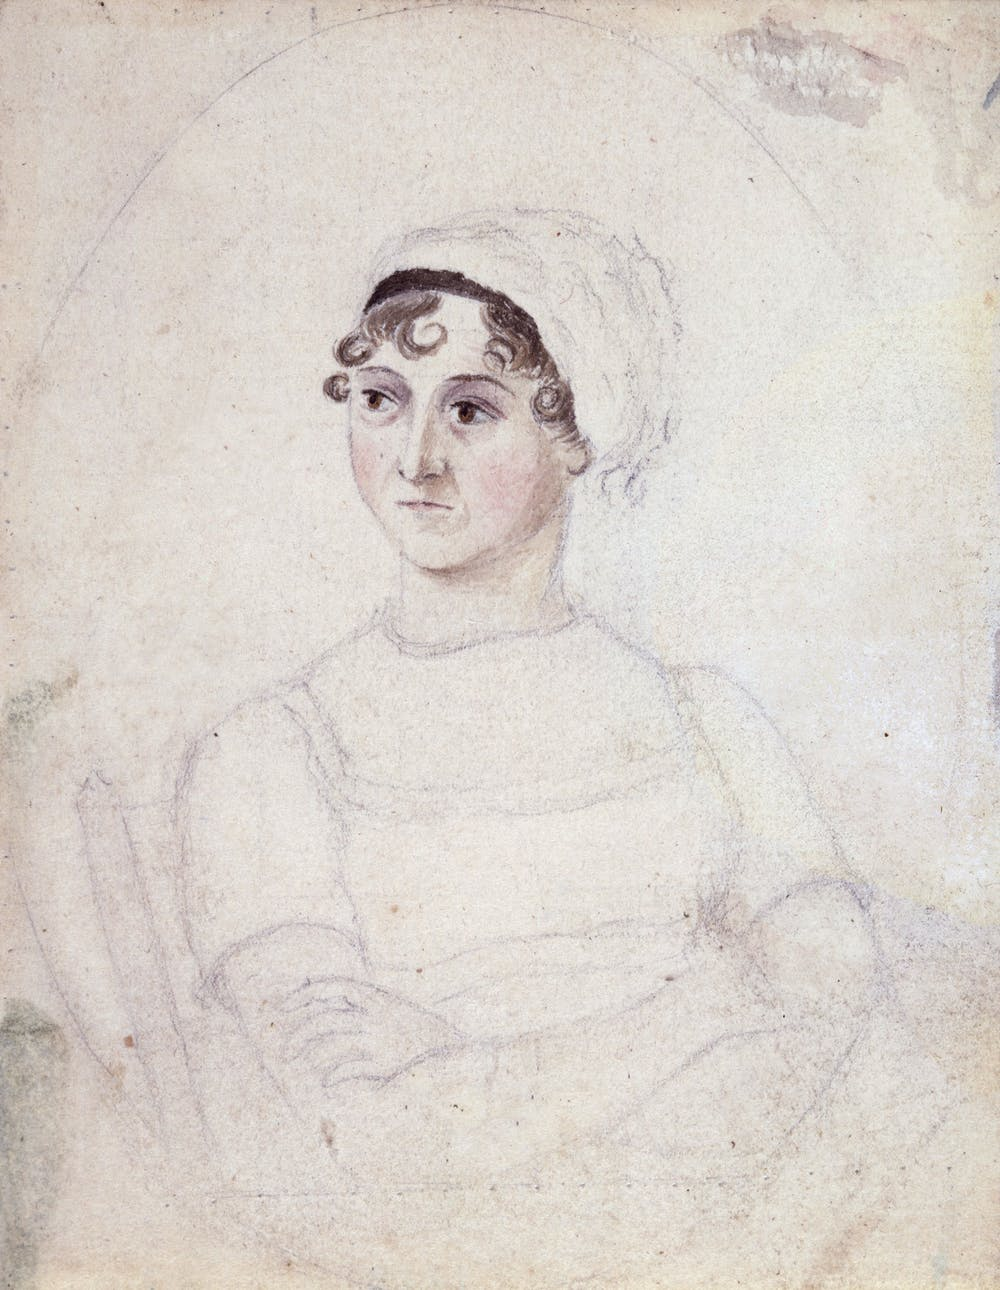 Friday essay: the revolutionary vision of Jane Austen